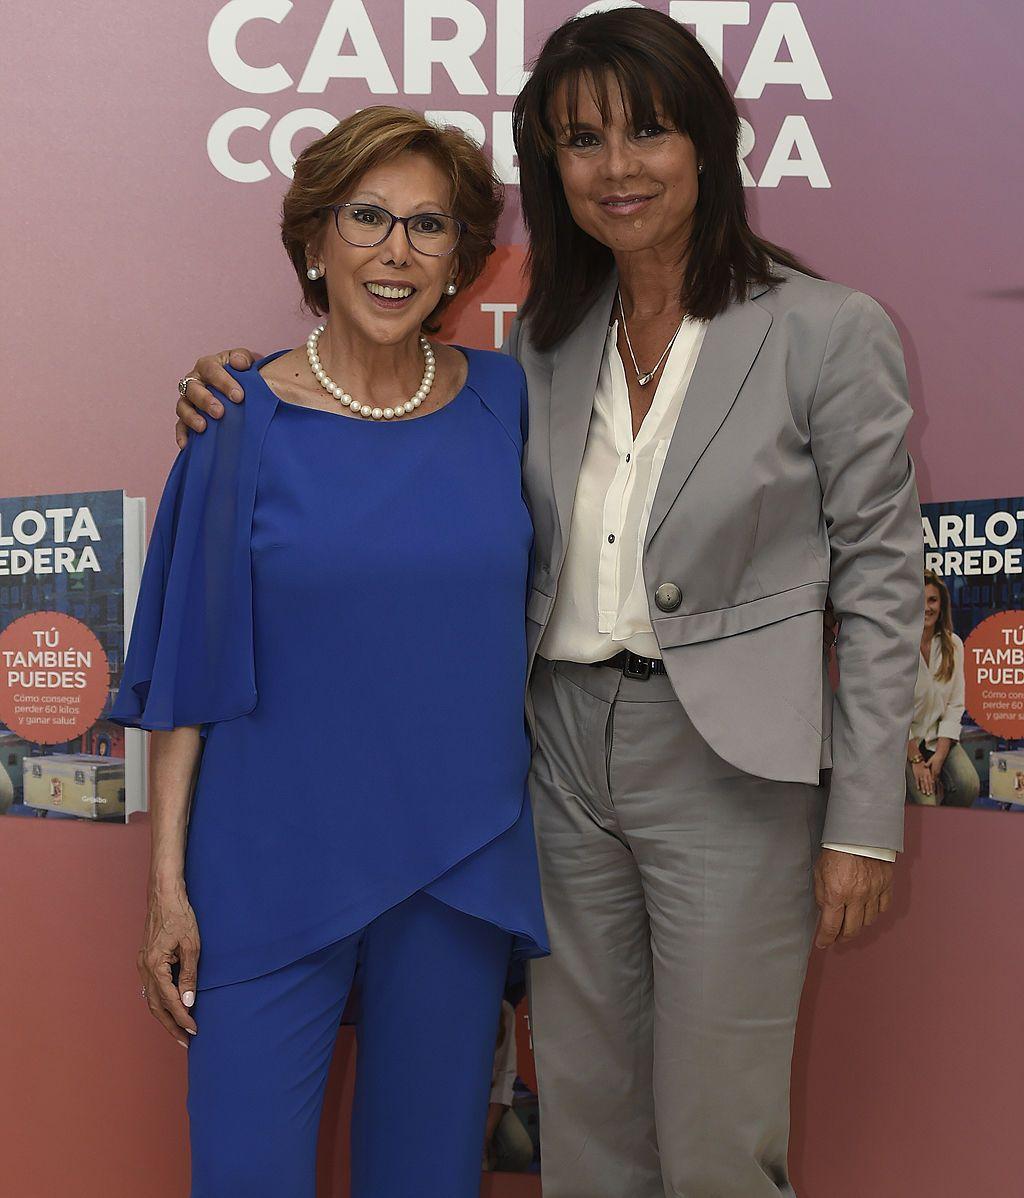 Doctora Saavedra y Doctora Montse Folch